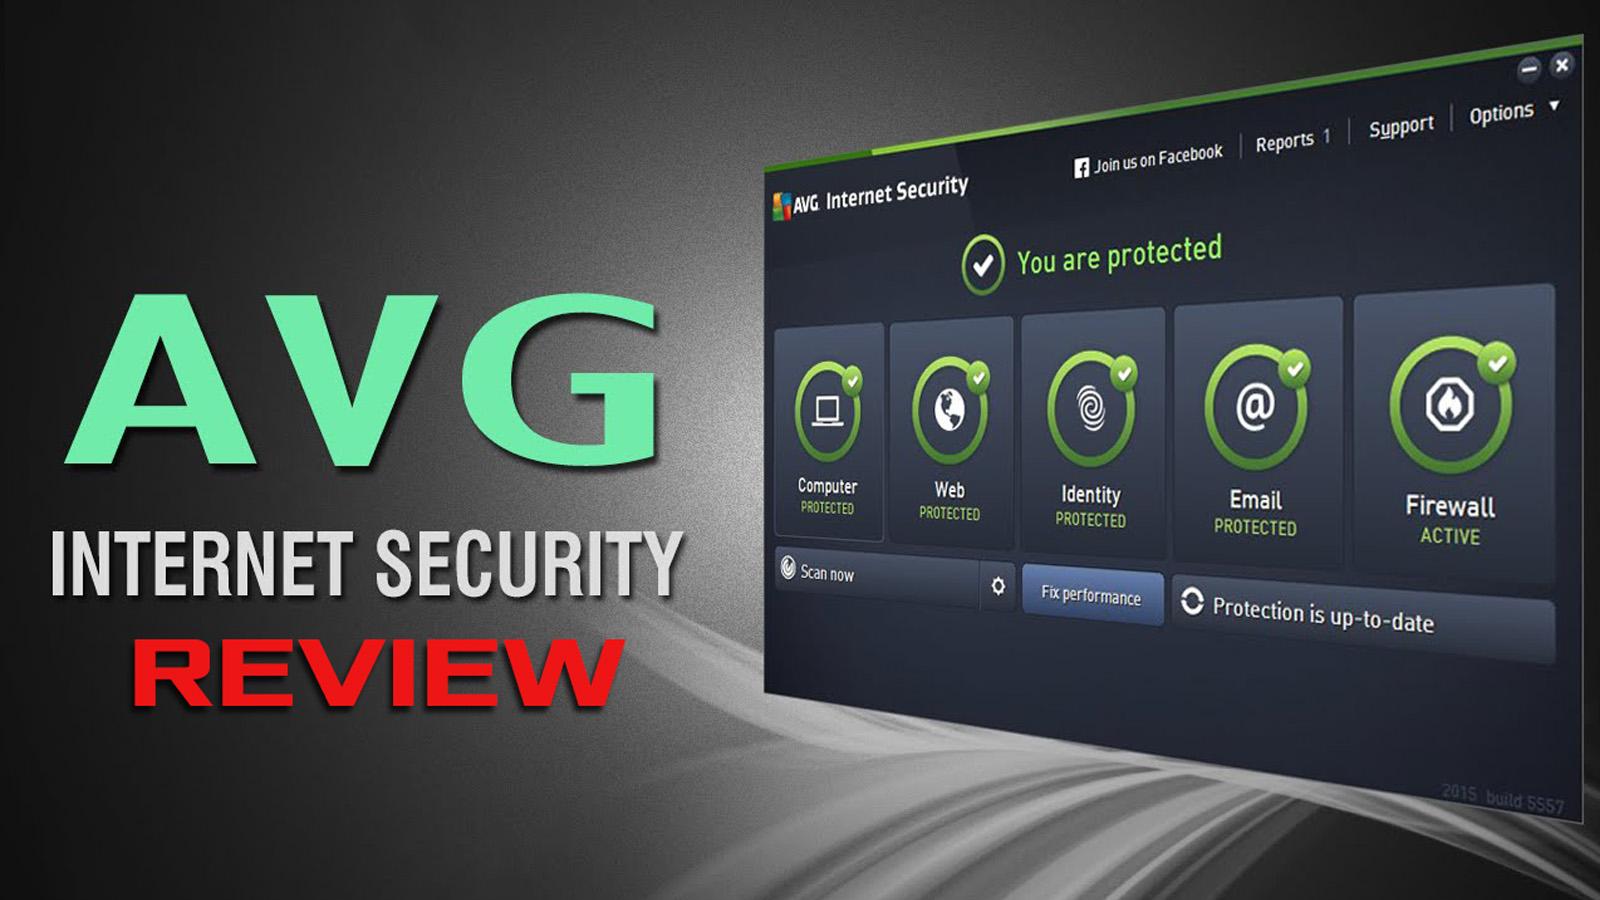 AVG Internet Security Program